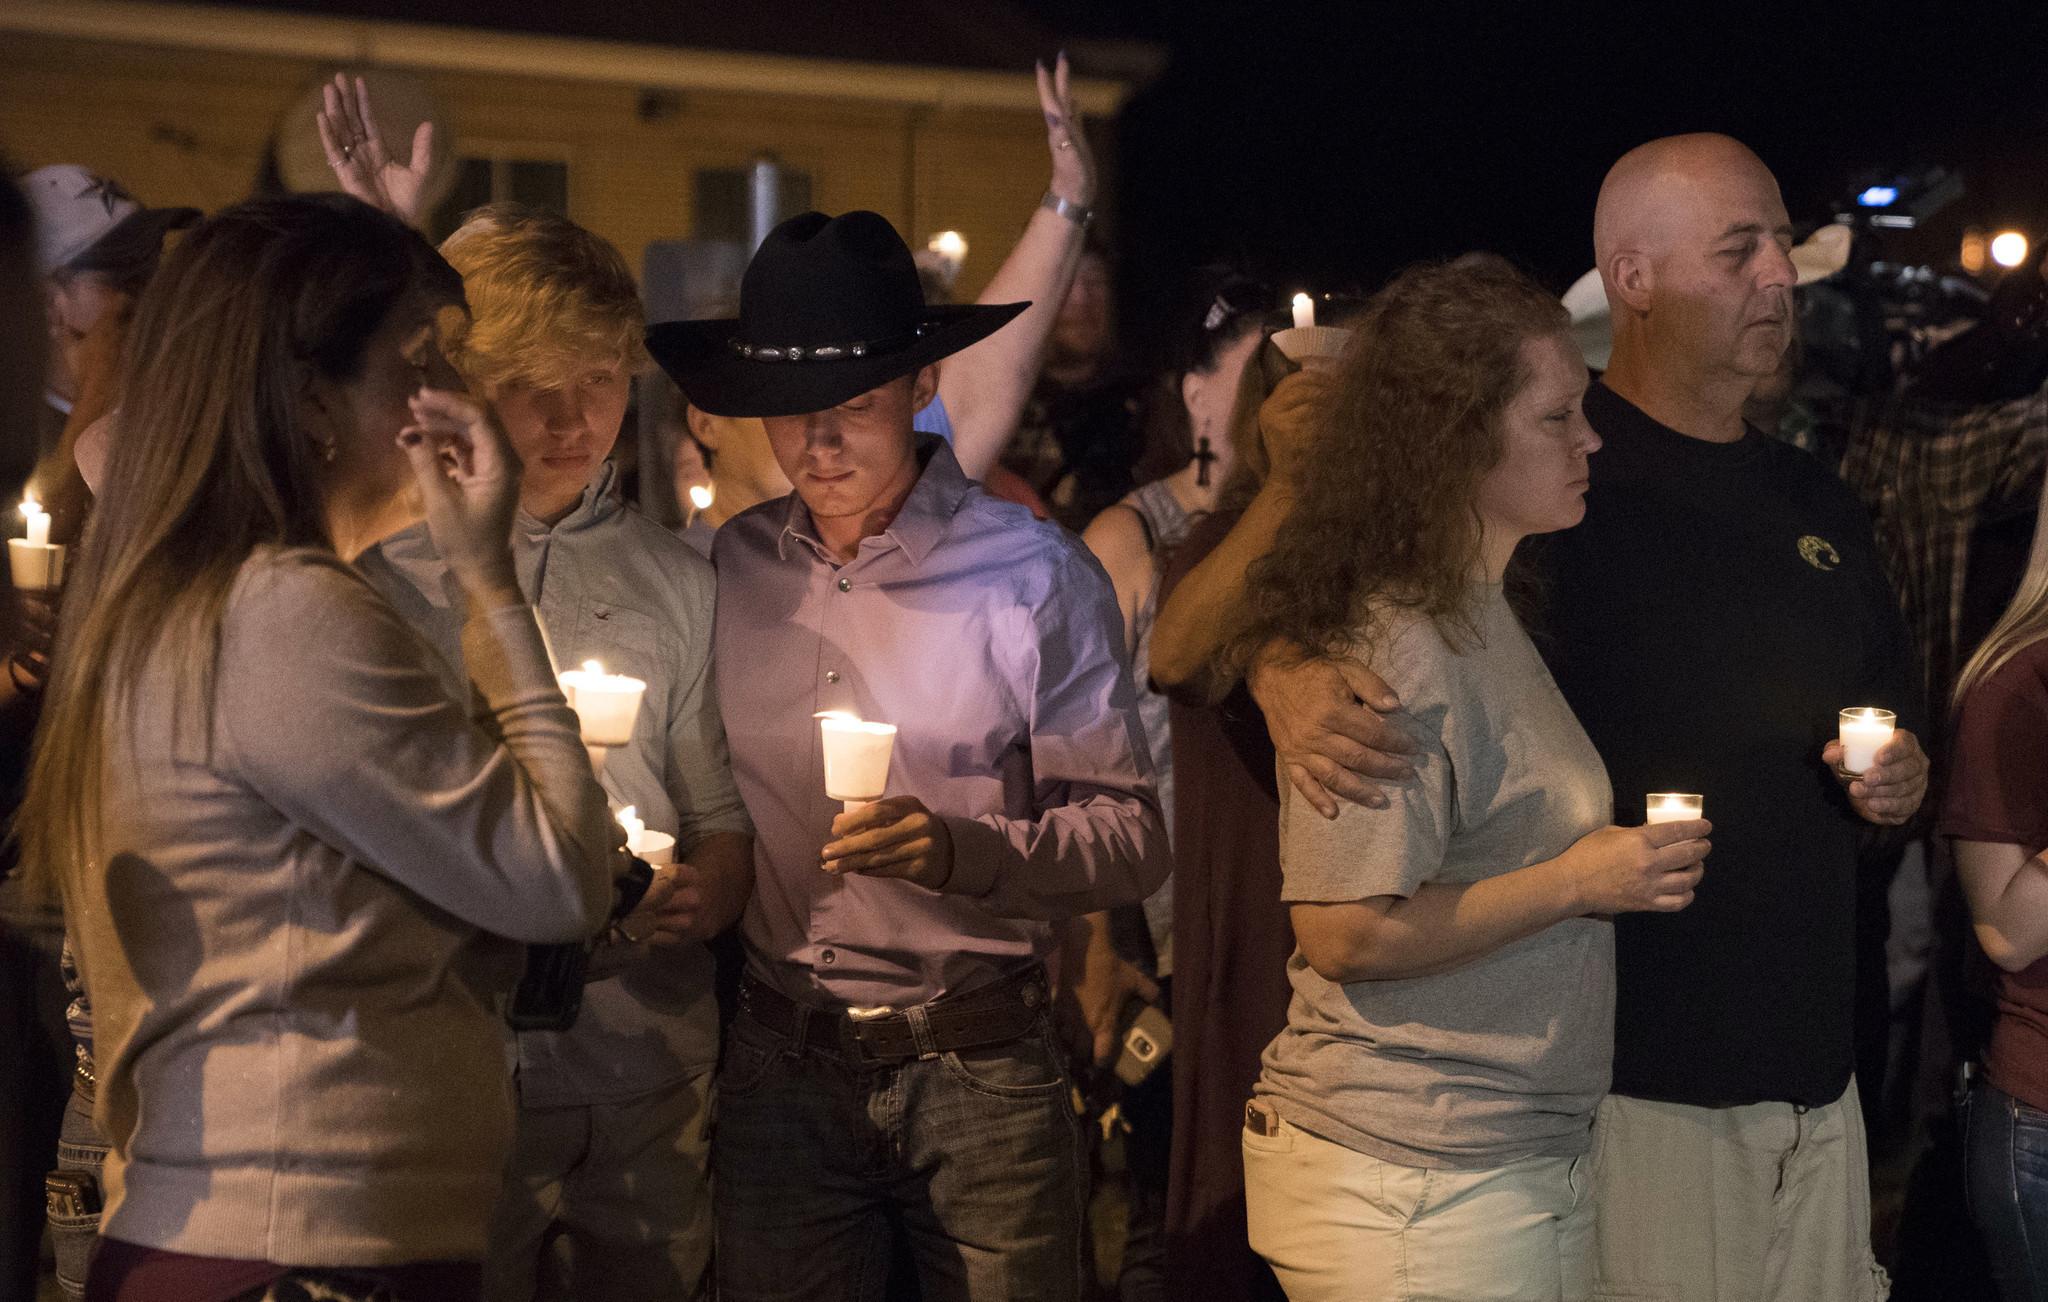 Texas Church Massacre Followed Domestic Situation